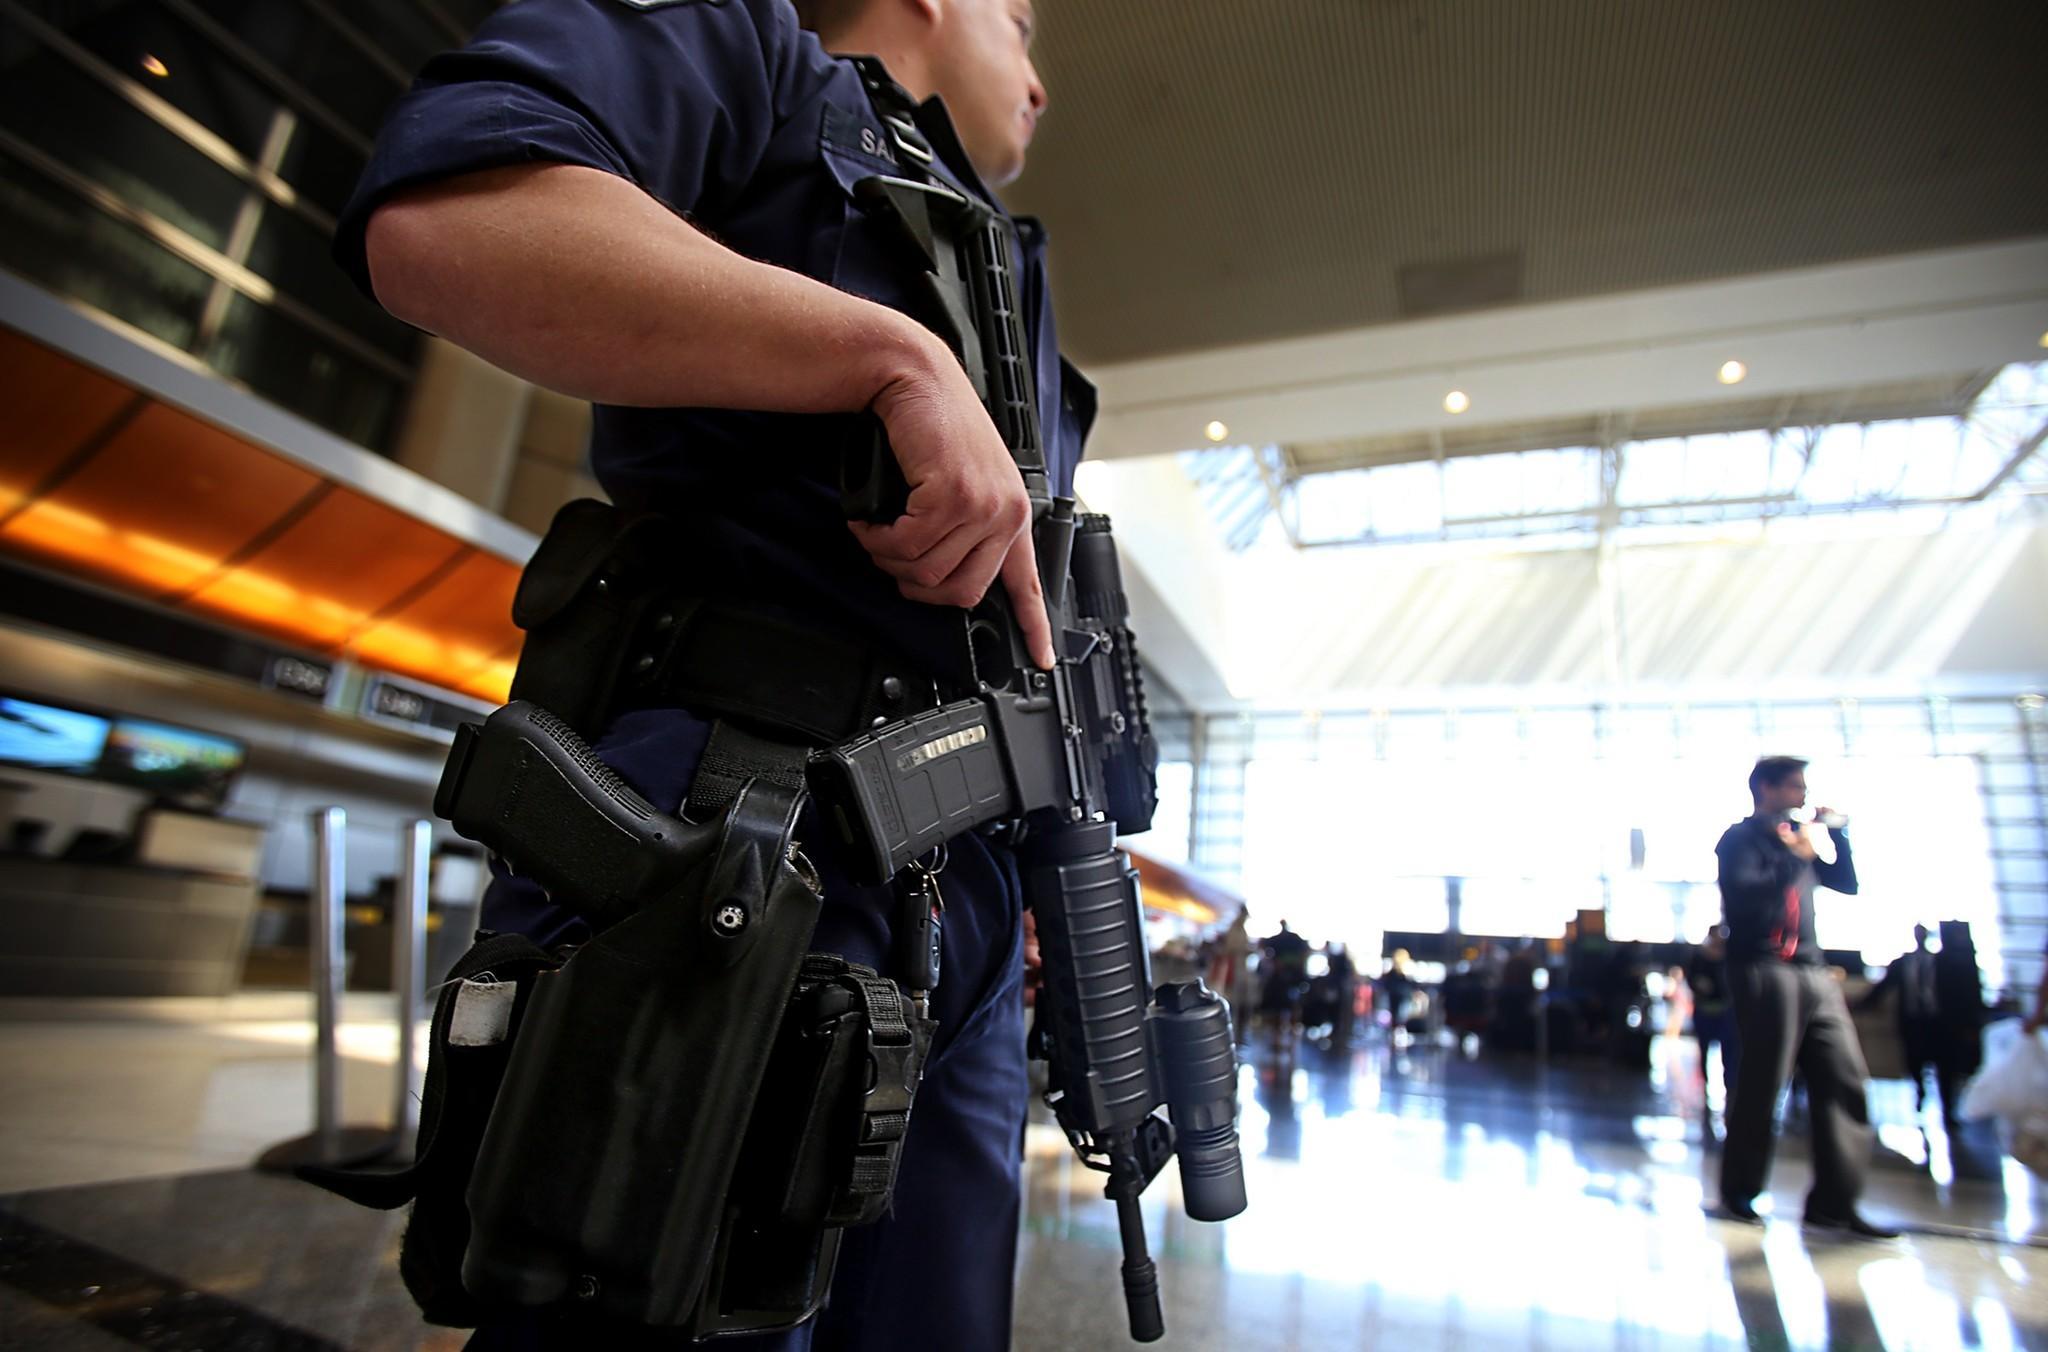 wwwtrbimgcomimg 5336469bturbinelat la me lax - Transportation Security Officer